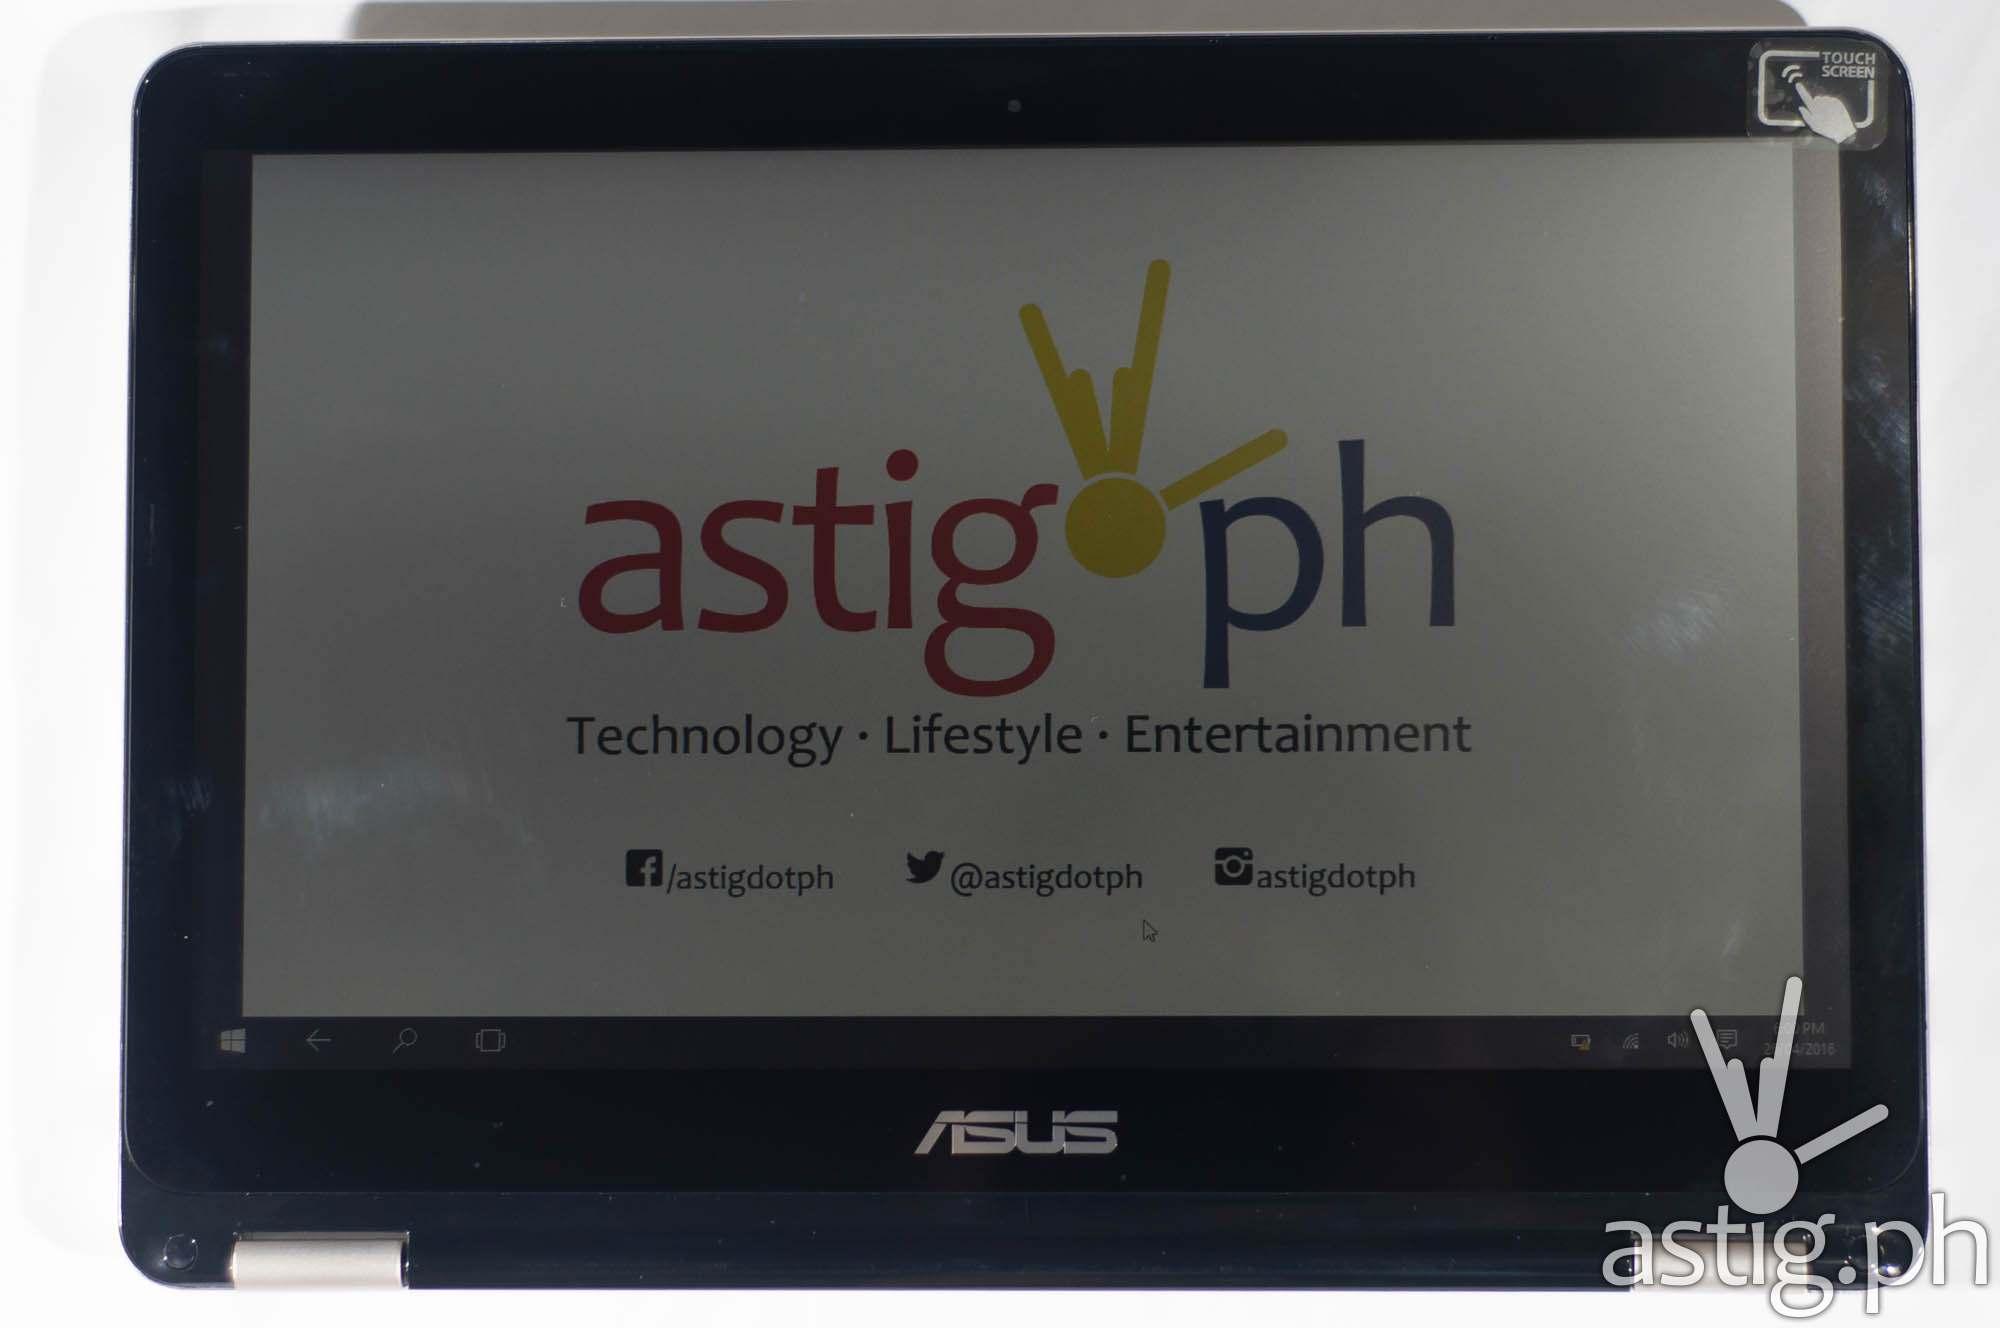 Asus Vivobook Flip 360 Tp201sa No Os Gold Daftar Harga Terbaru Fv0027d Laptop 116 Inch Hd Touch Qc N3710 500gb Dos You Can The Converting Your Notebook Computer